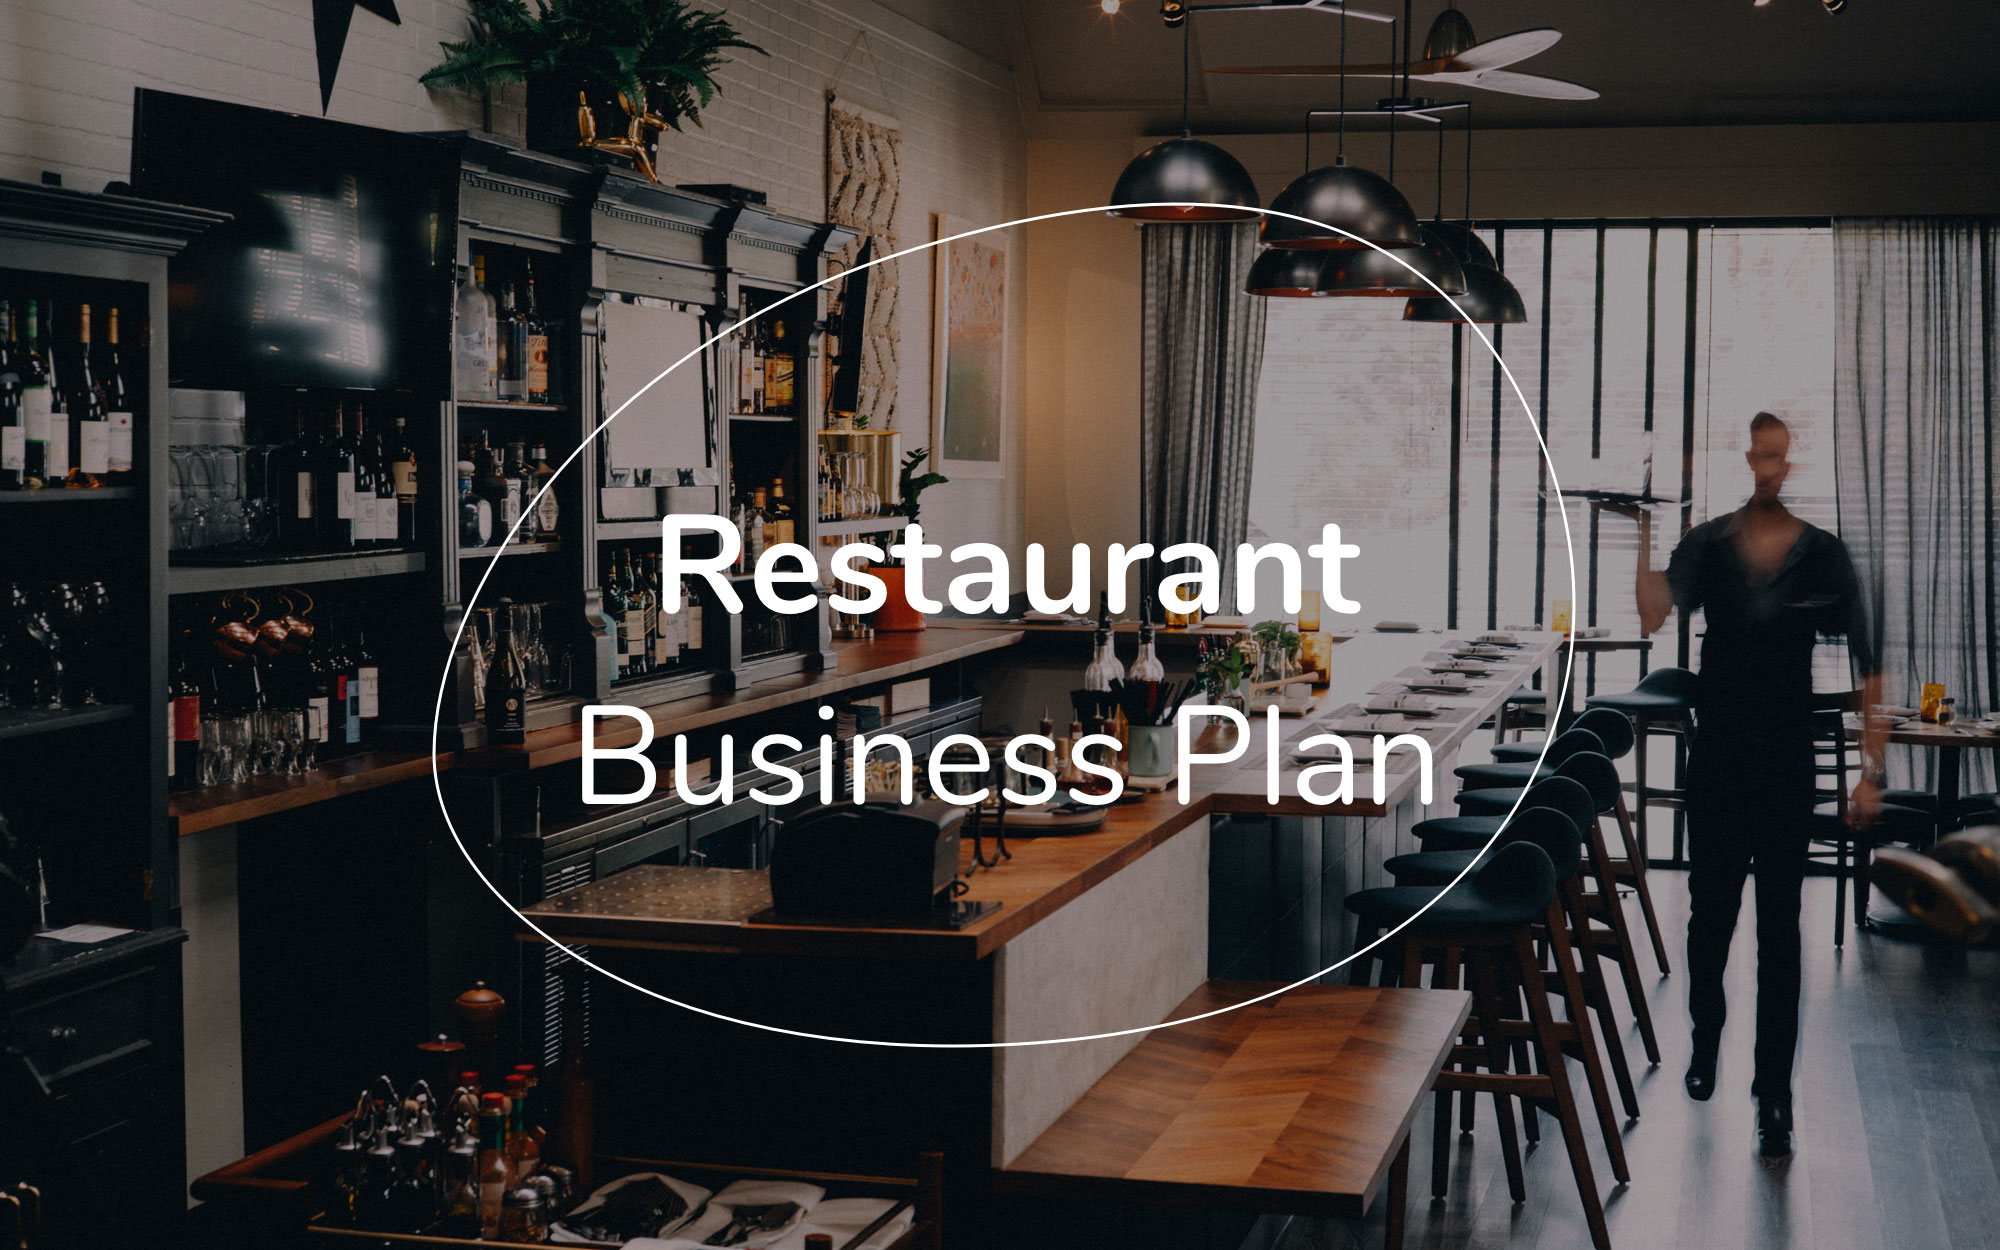 Restaurant business plan template free pdf ppt download slidebean restaurant business plan template free pdf ppt download accmission Images